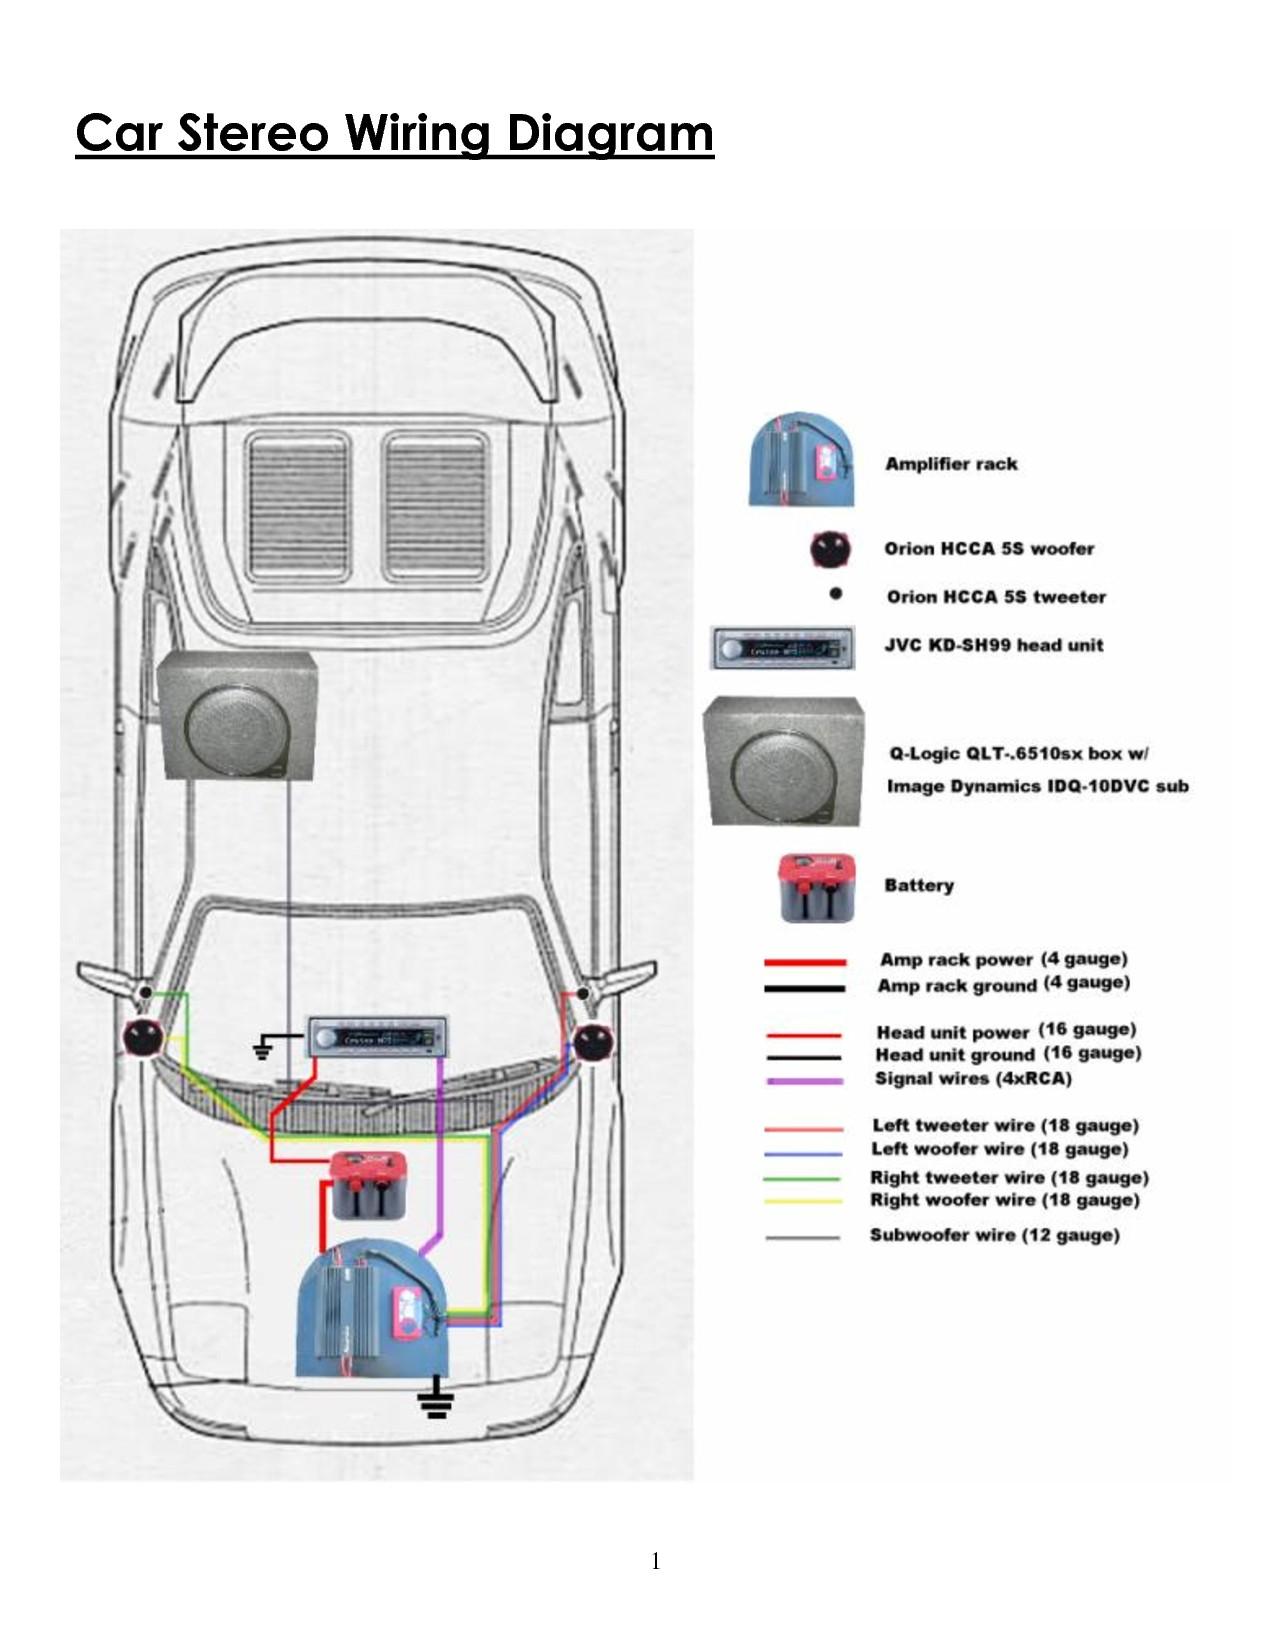 car stereo system diagram car audio wiring diagram pioneer radio rh detoxicrecenze com Car Speaker Wiring Diagram Car Stereo Wiring Harness Diagram